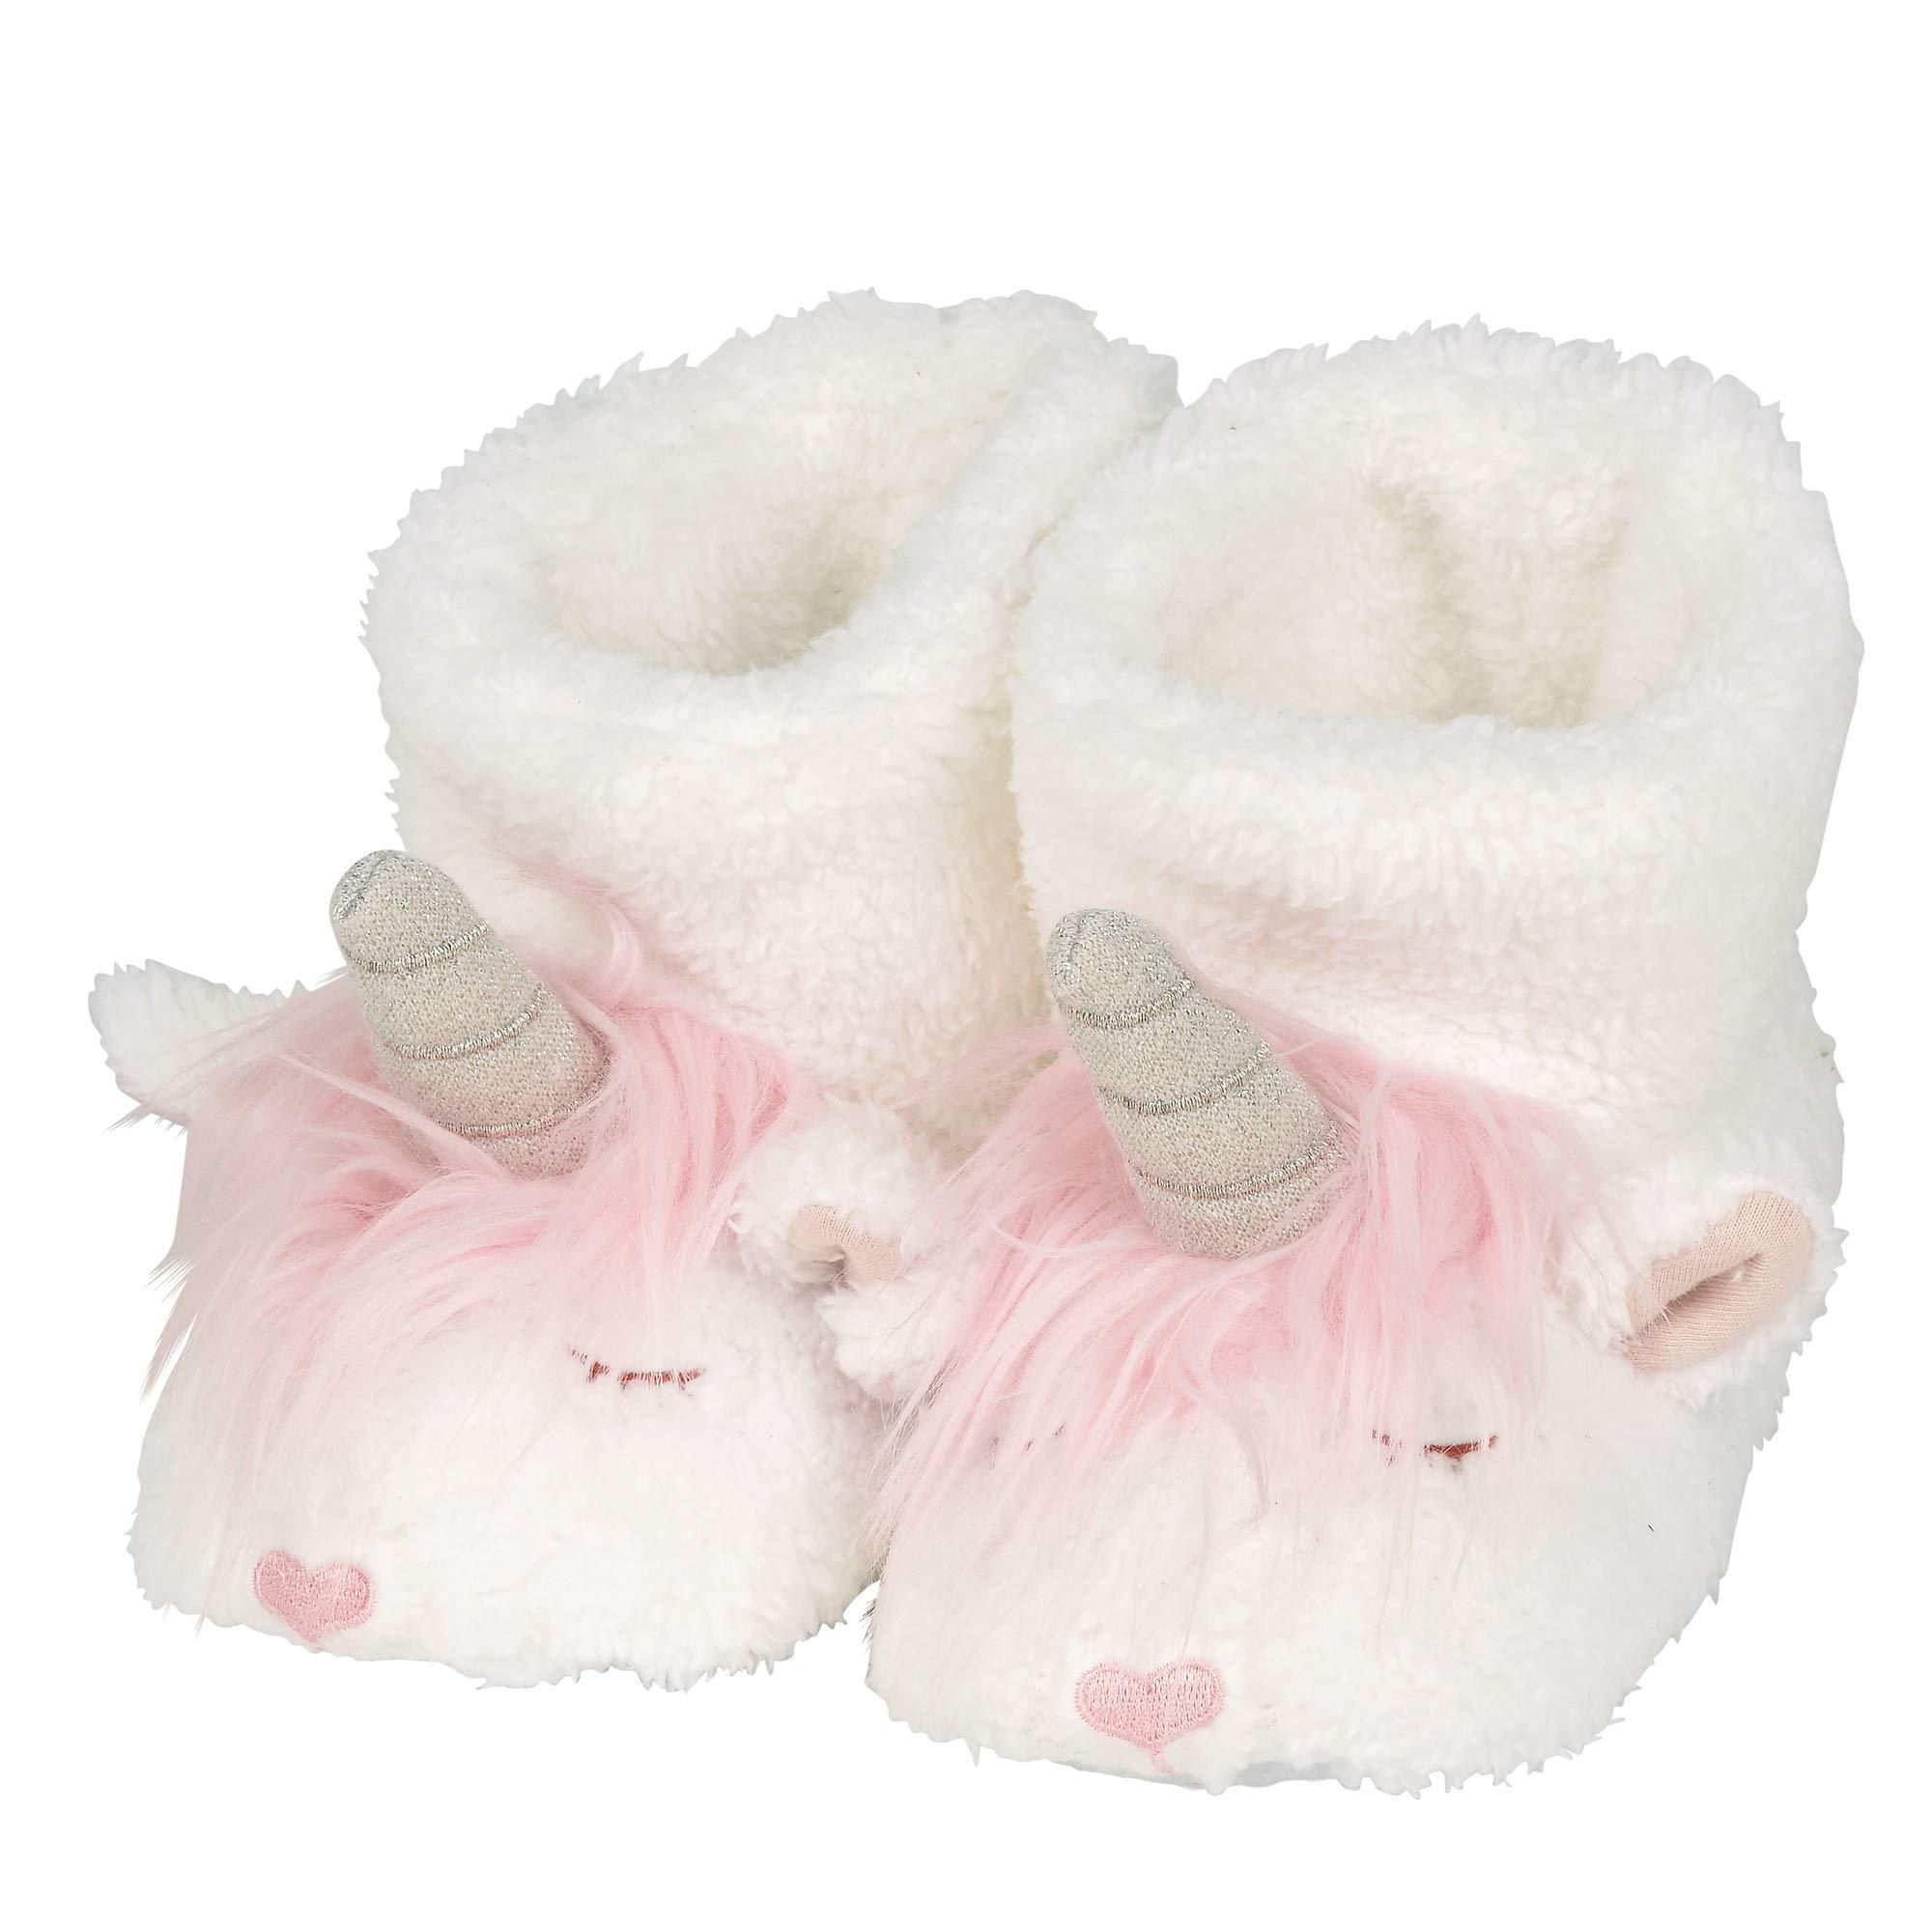 Department 56 Snowpinions, Child Small (Sizes 7-8) Unicorn Slippers, Multicolor